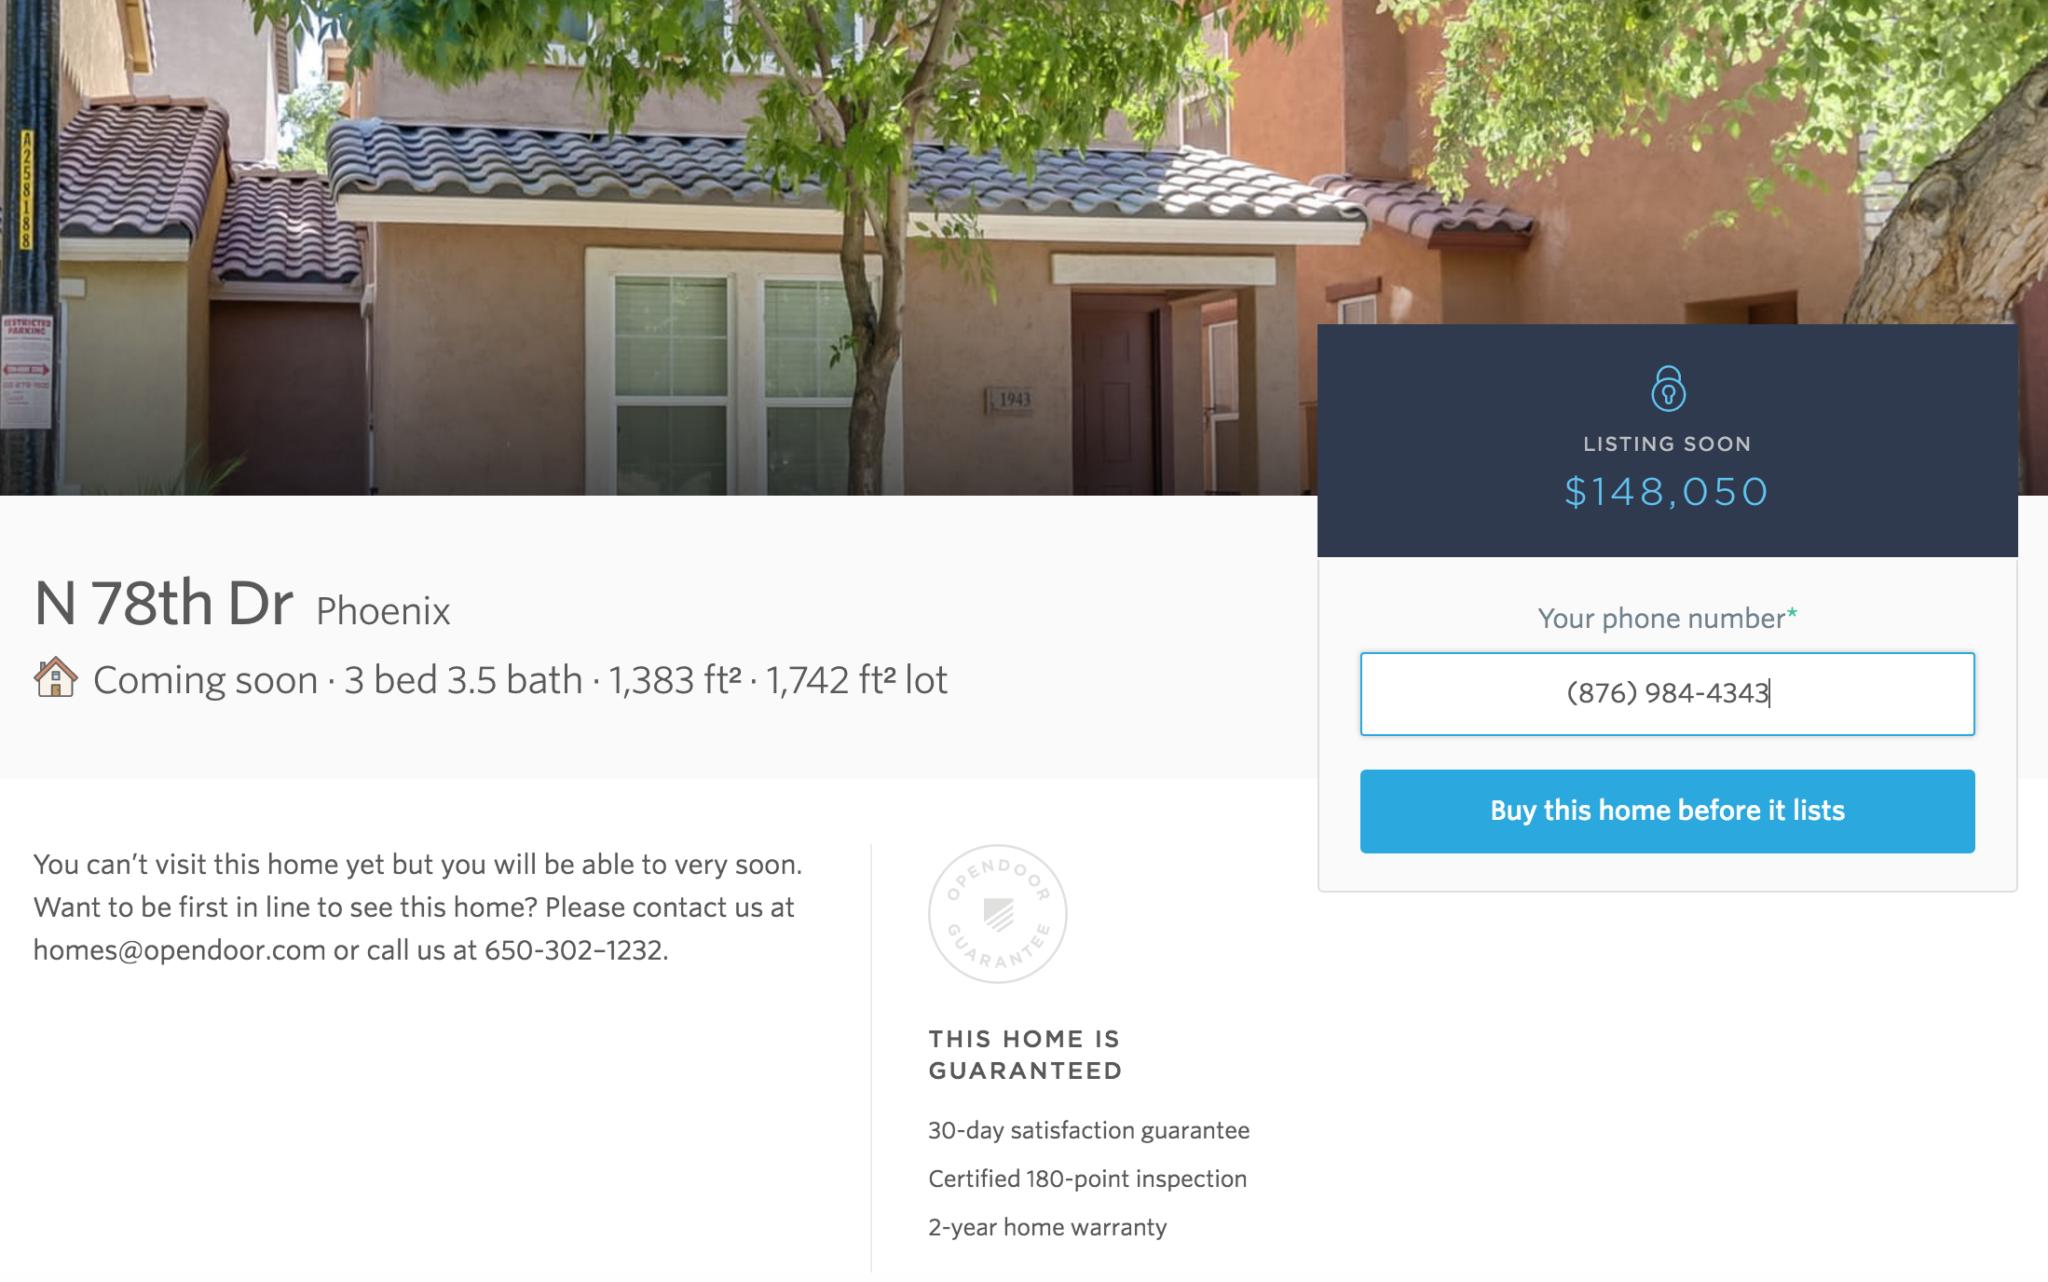 opendoor-buy-this-home-before-it-lists